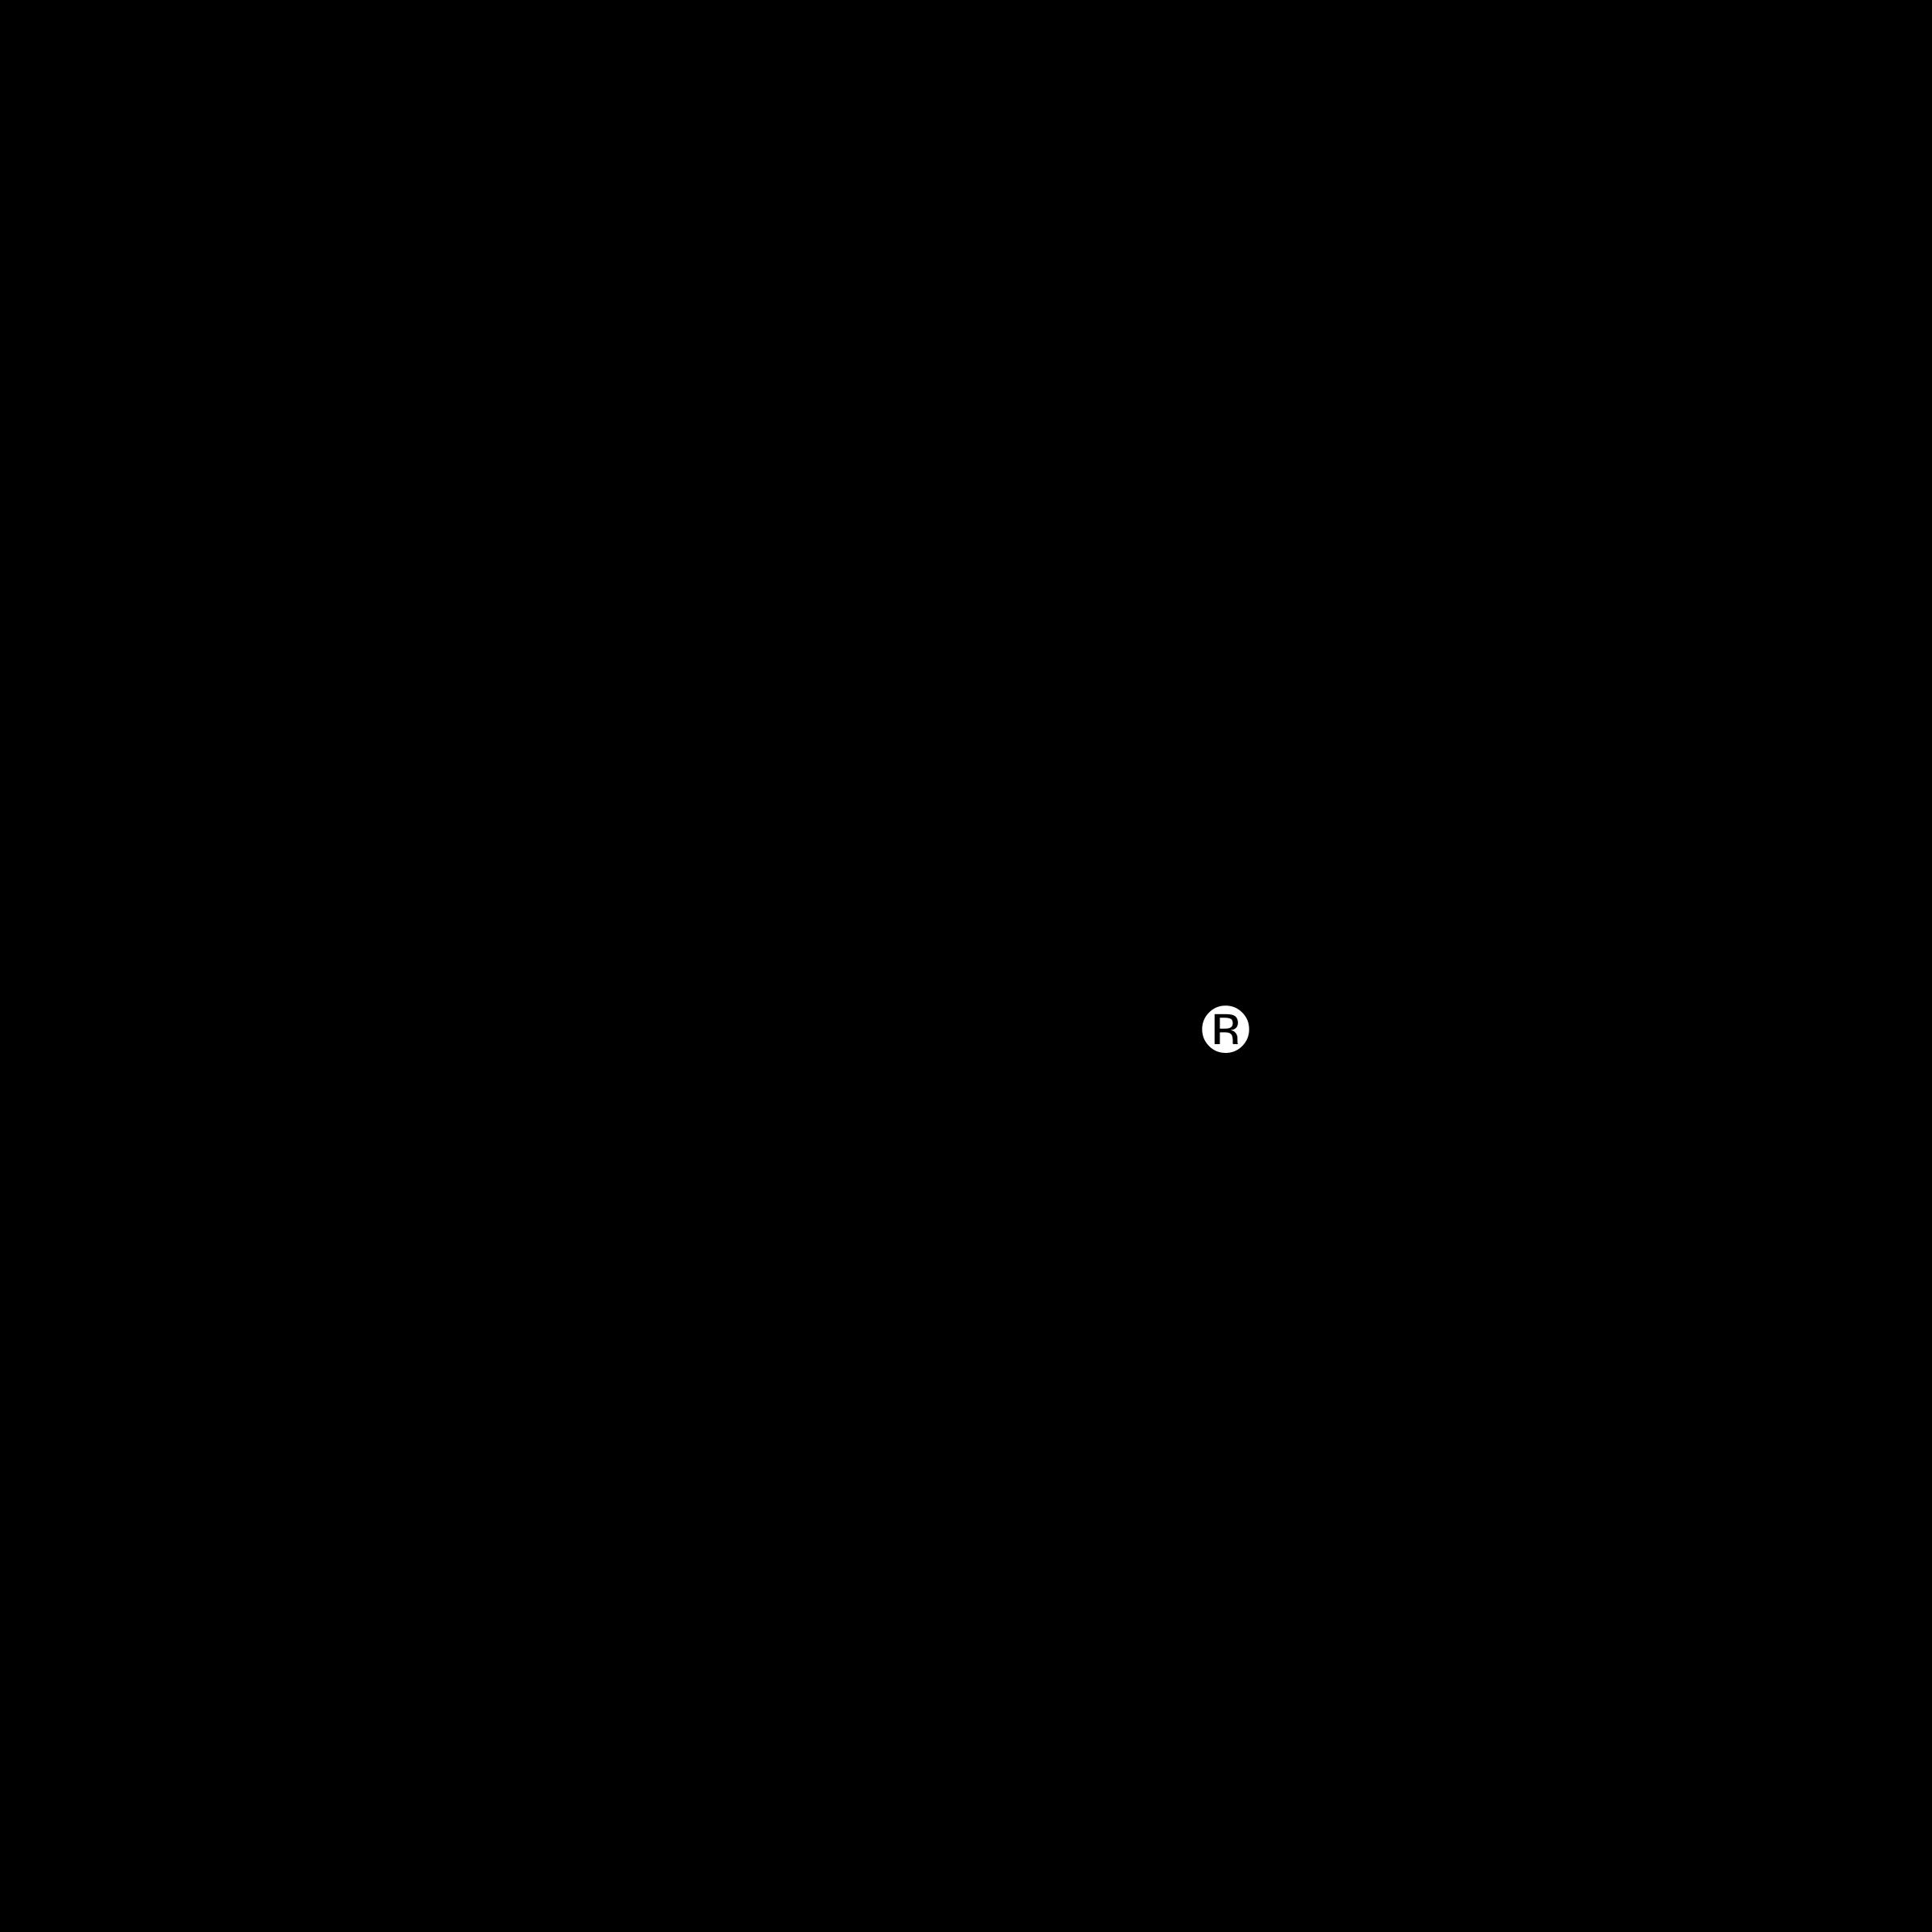 kaiser-permanente-3-logo-png-transparent.png